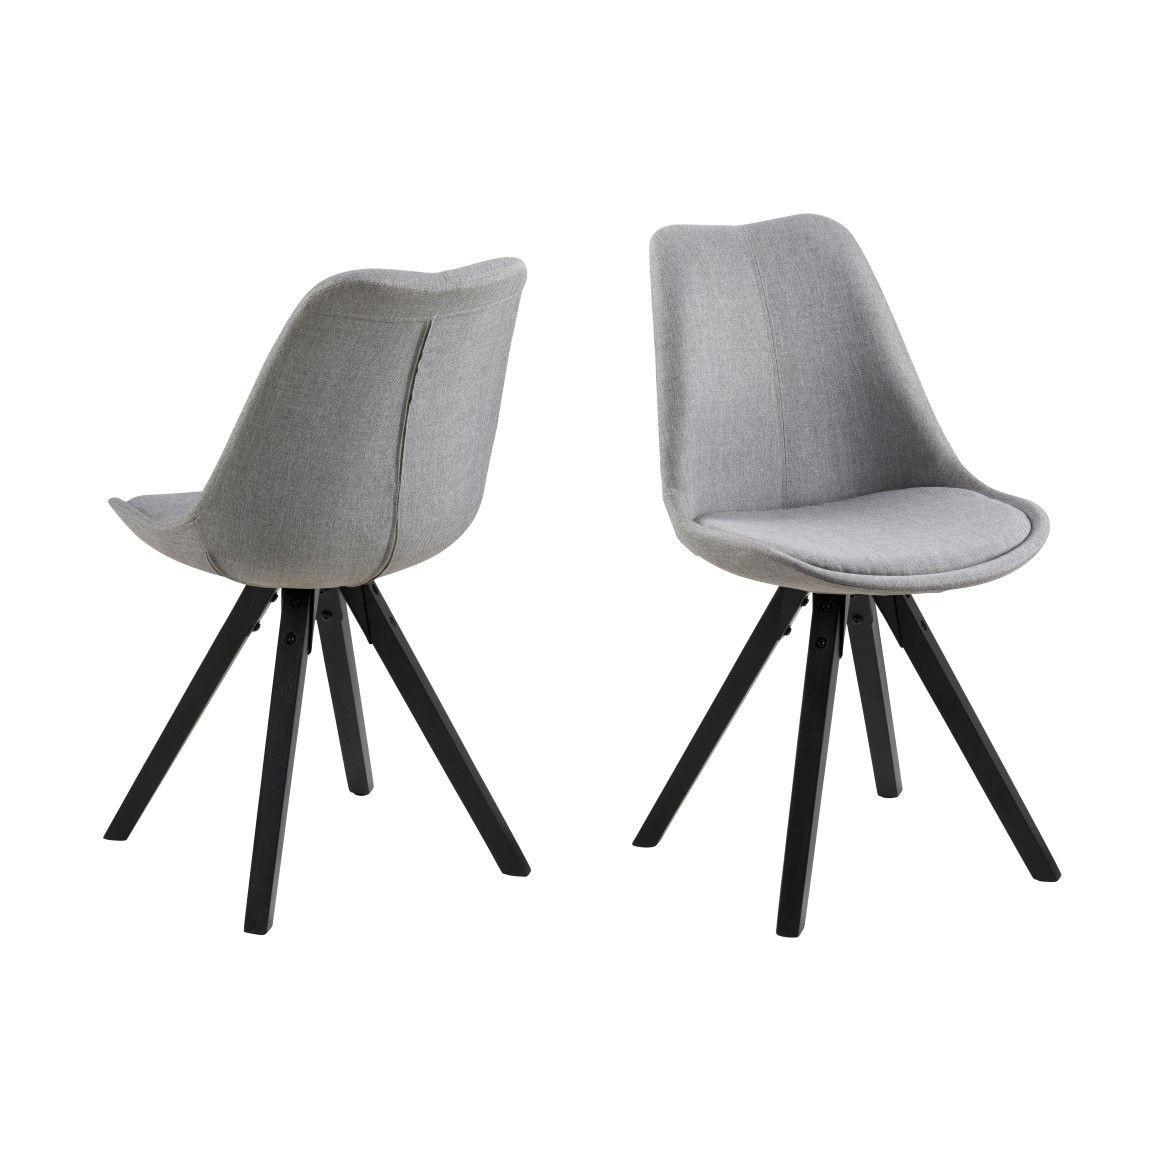 Set of 2 Chairs Nida   Grey